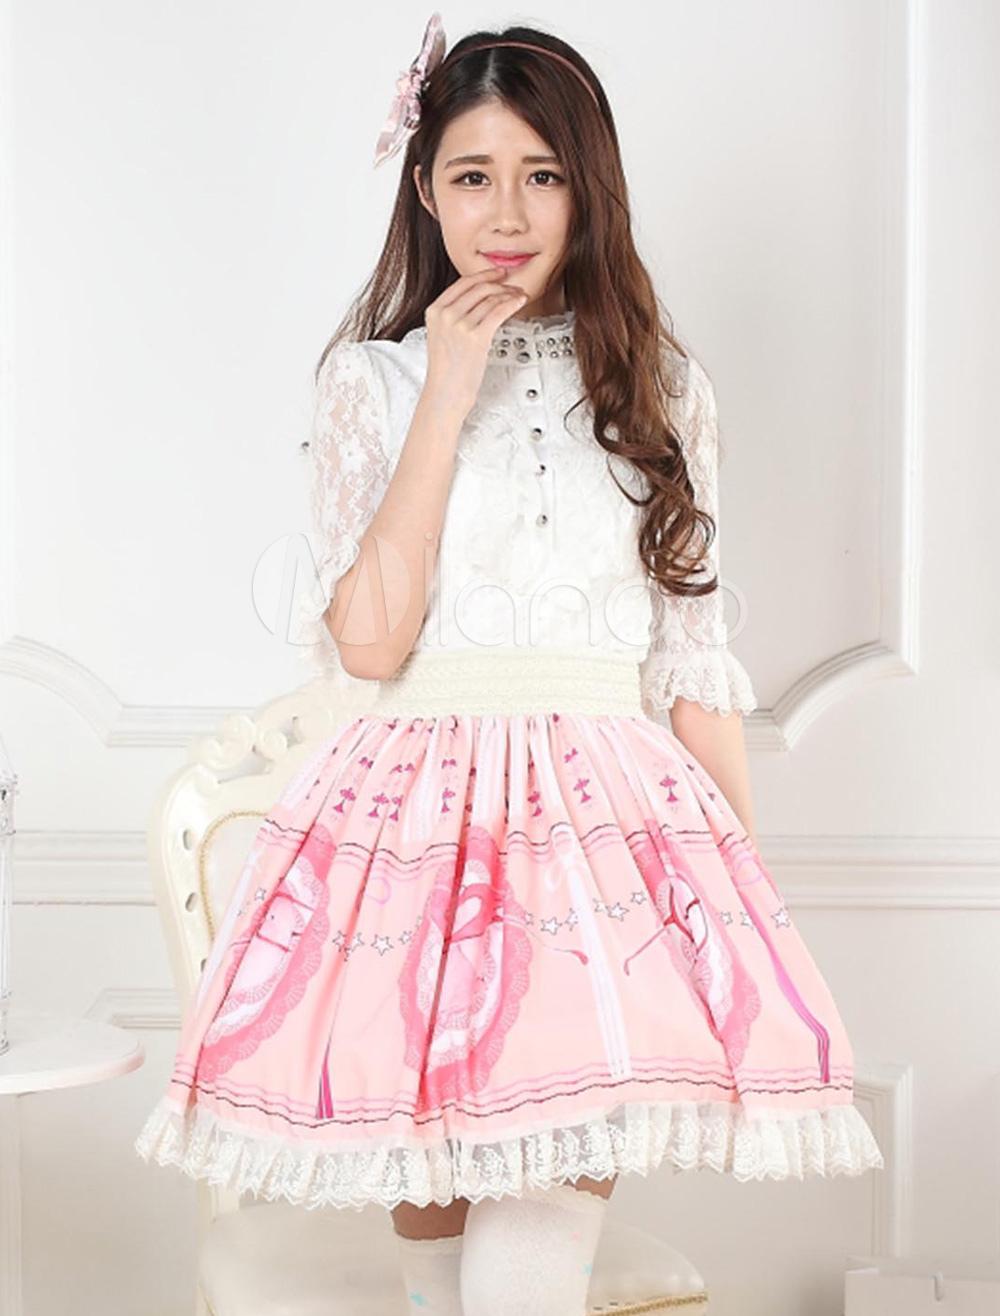 Milanoo / Printed Lace Lolita Skirt